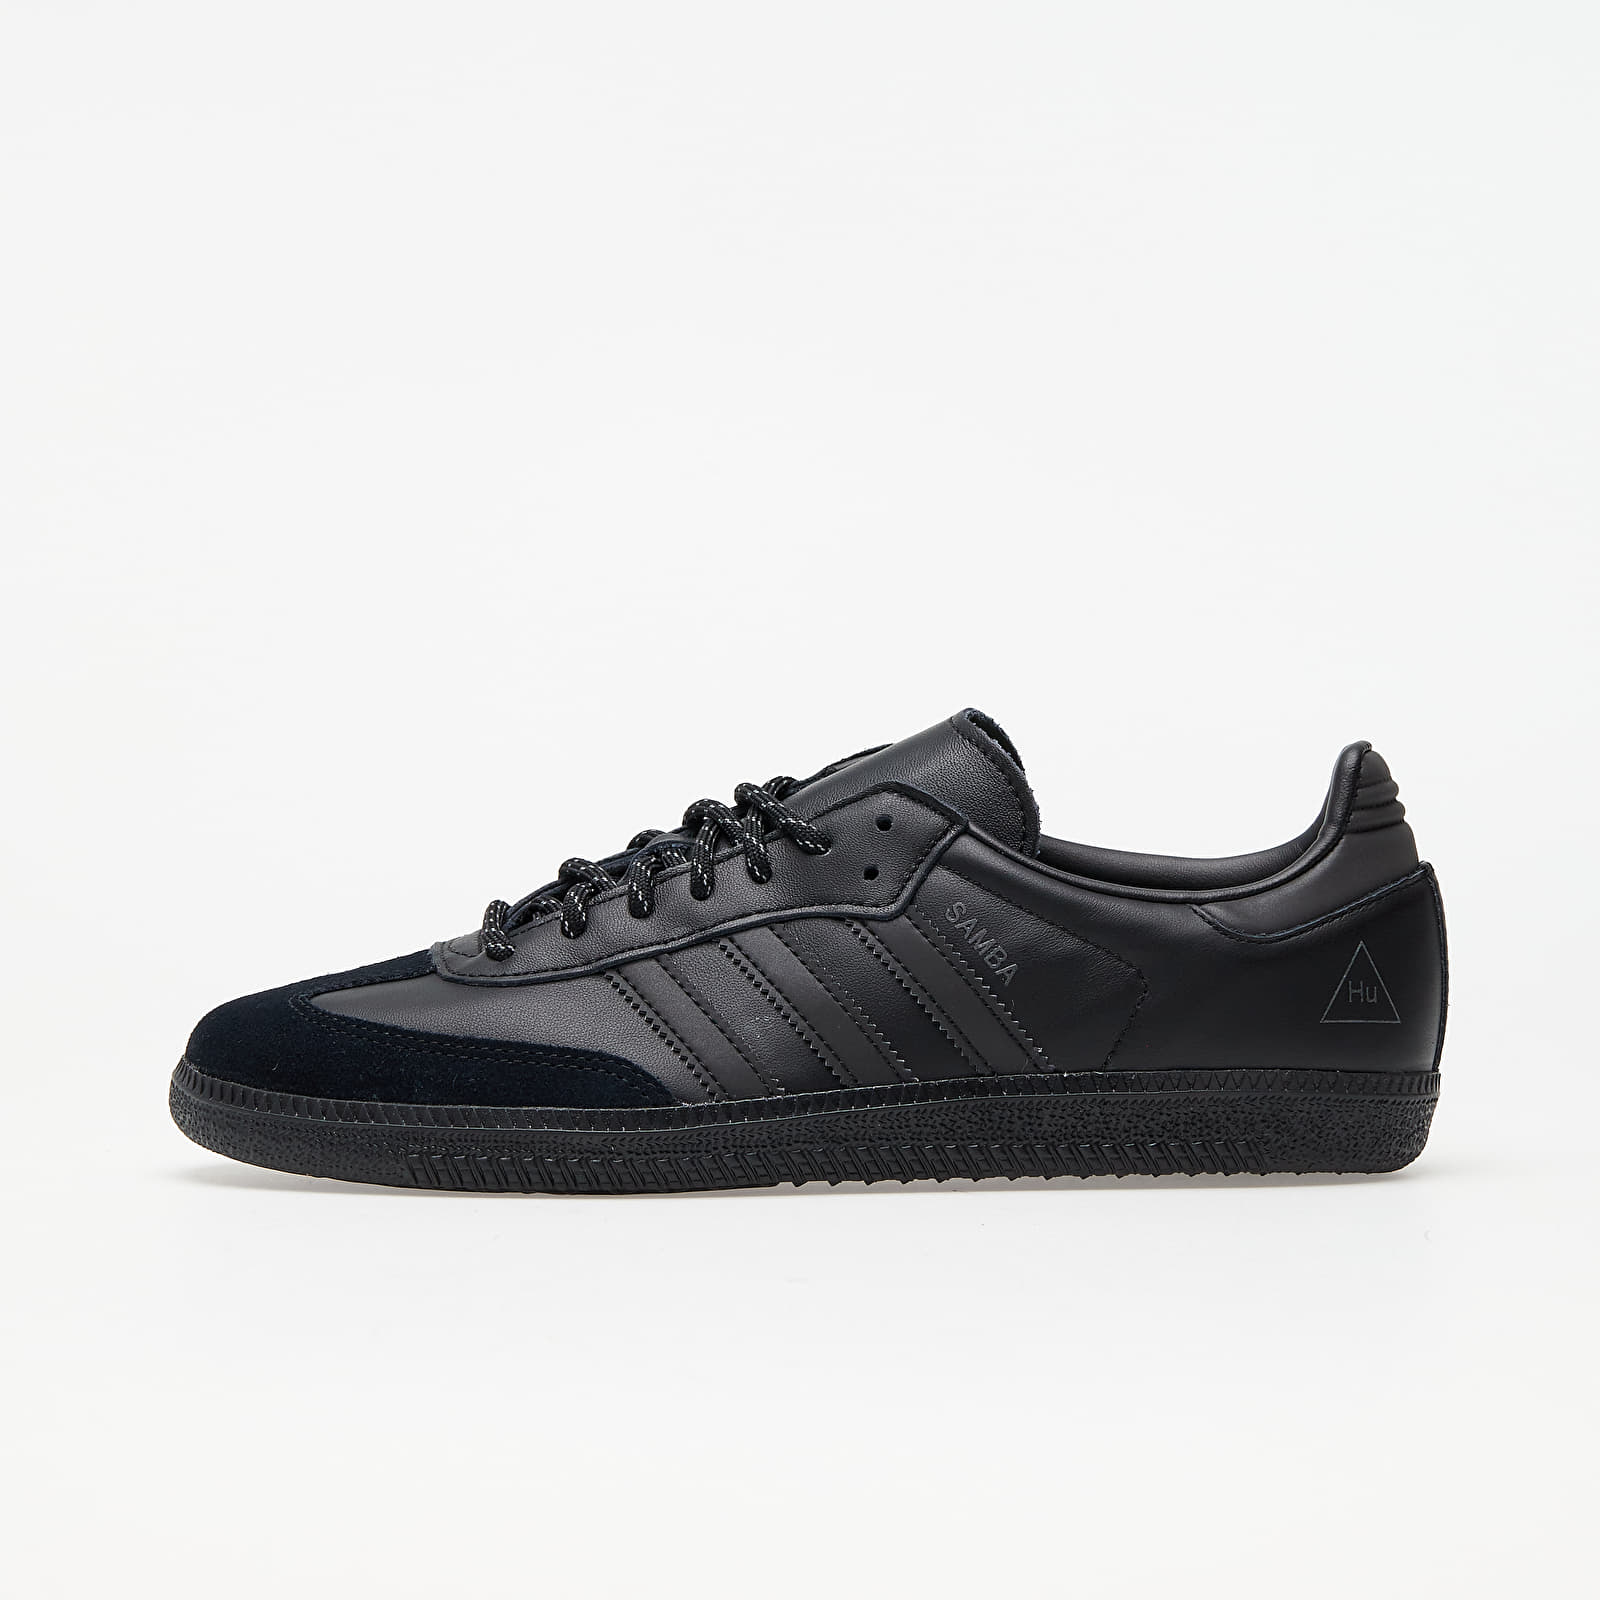 adidas x Pharrell Williams Samba Core Black/ Core Black/ Core Black GY4978